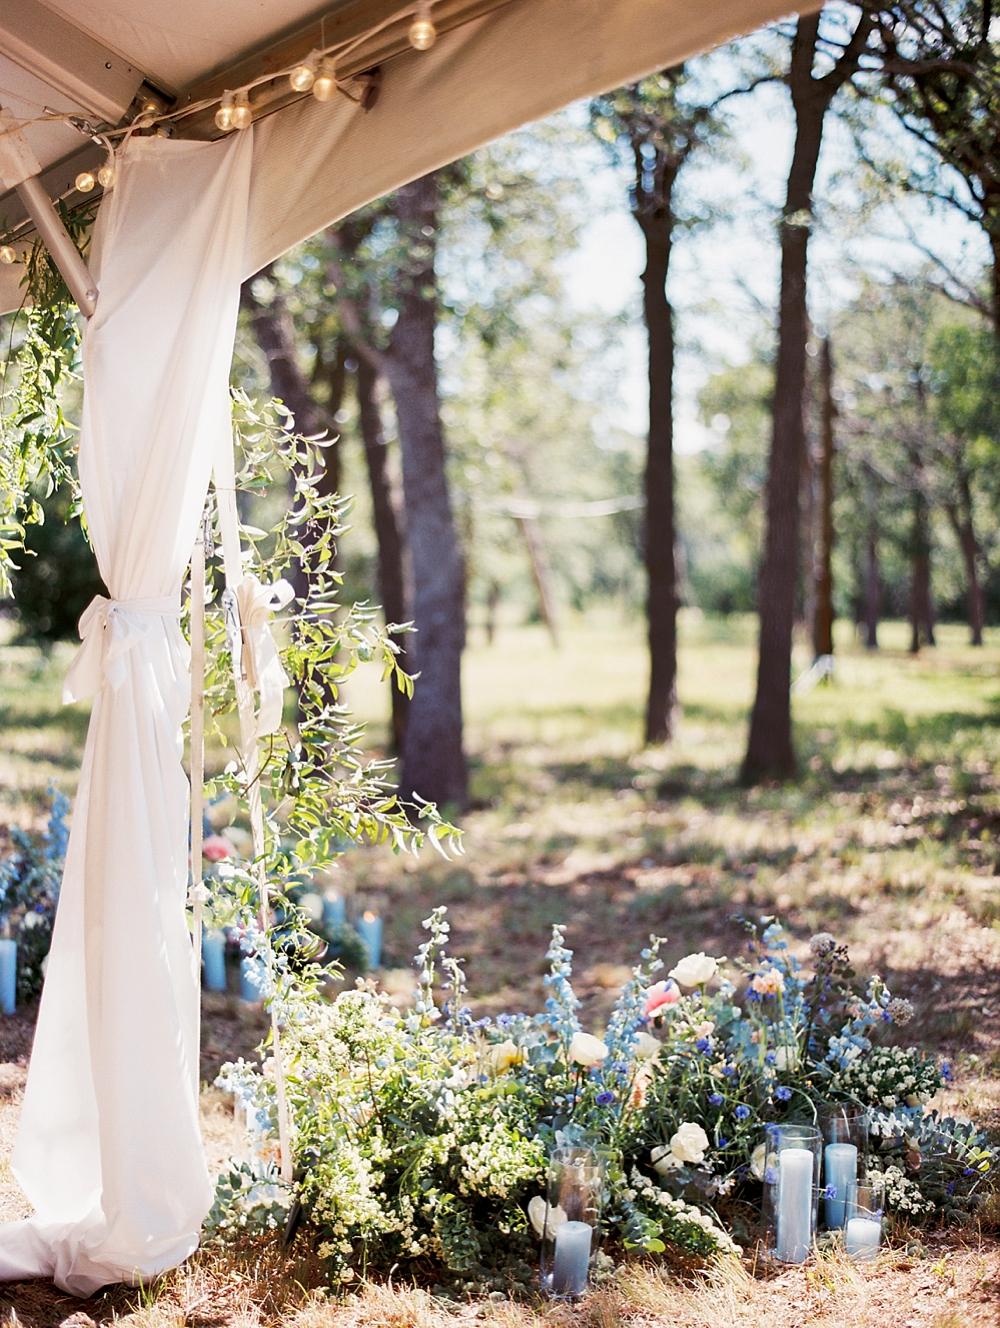 Kristin-La-Voie-Photography-Austin-Wedding-Photographer-the-grand-lady-152